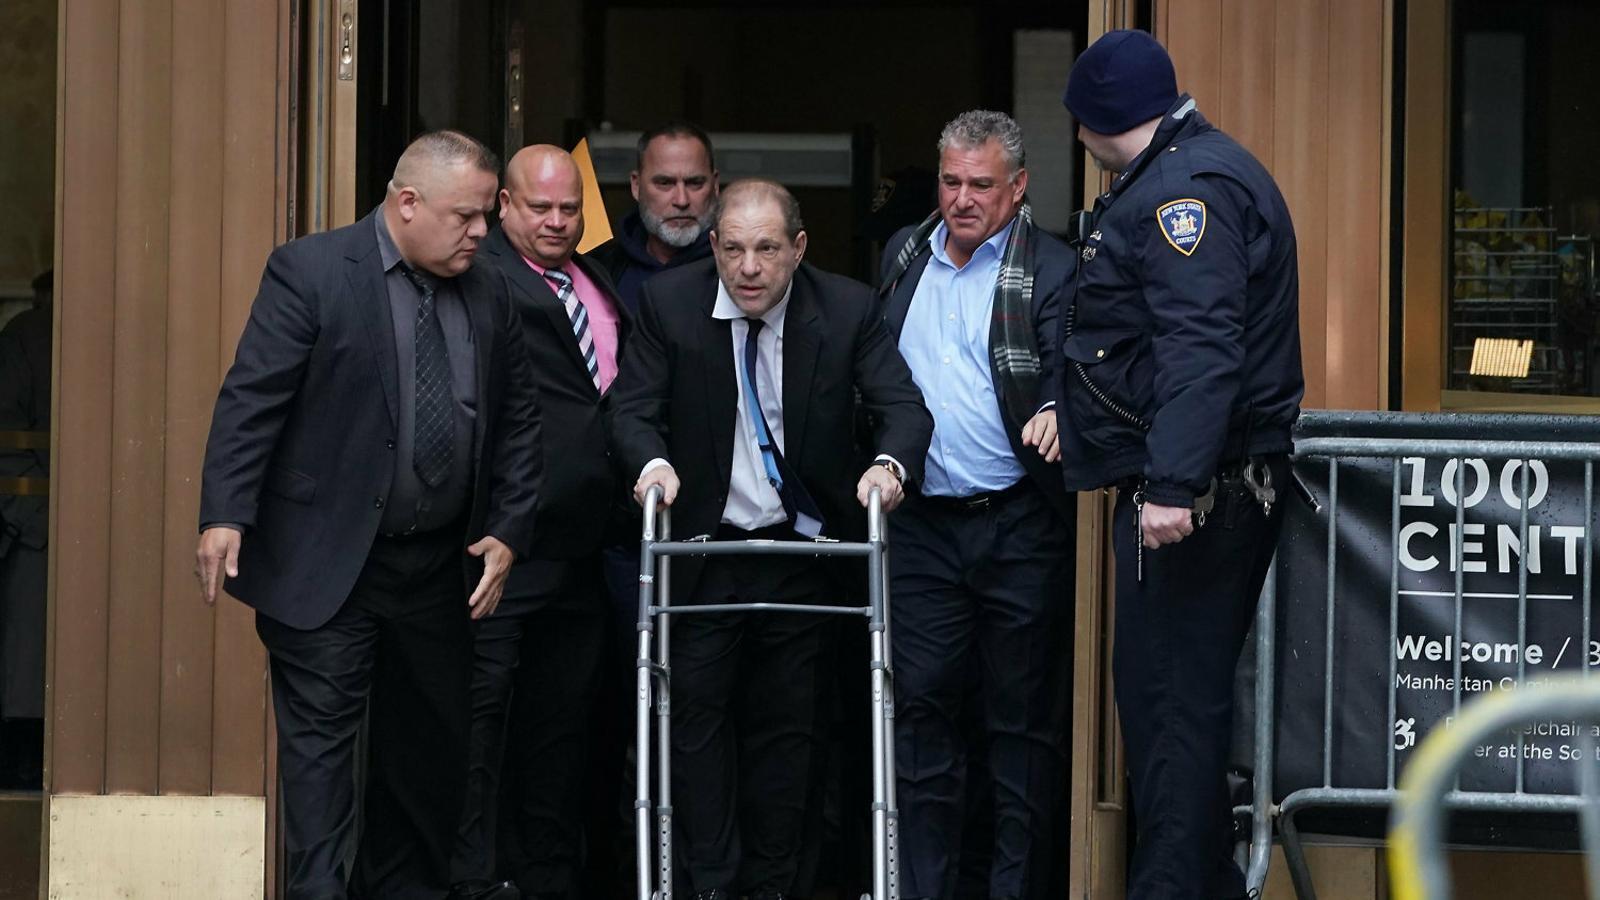 Harvey Weinstein, condemnat a 23 anys de presó